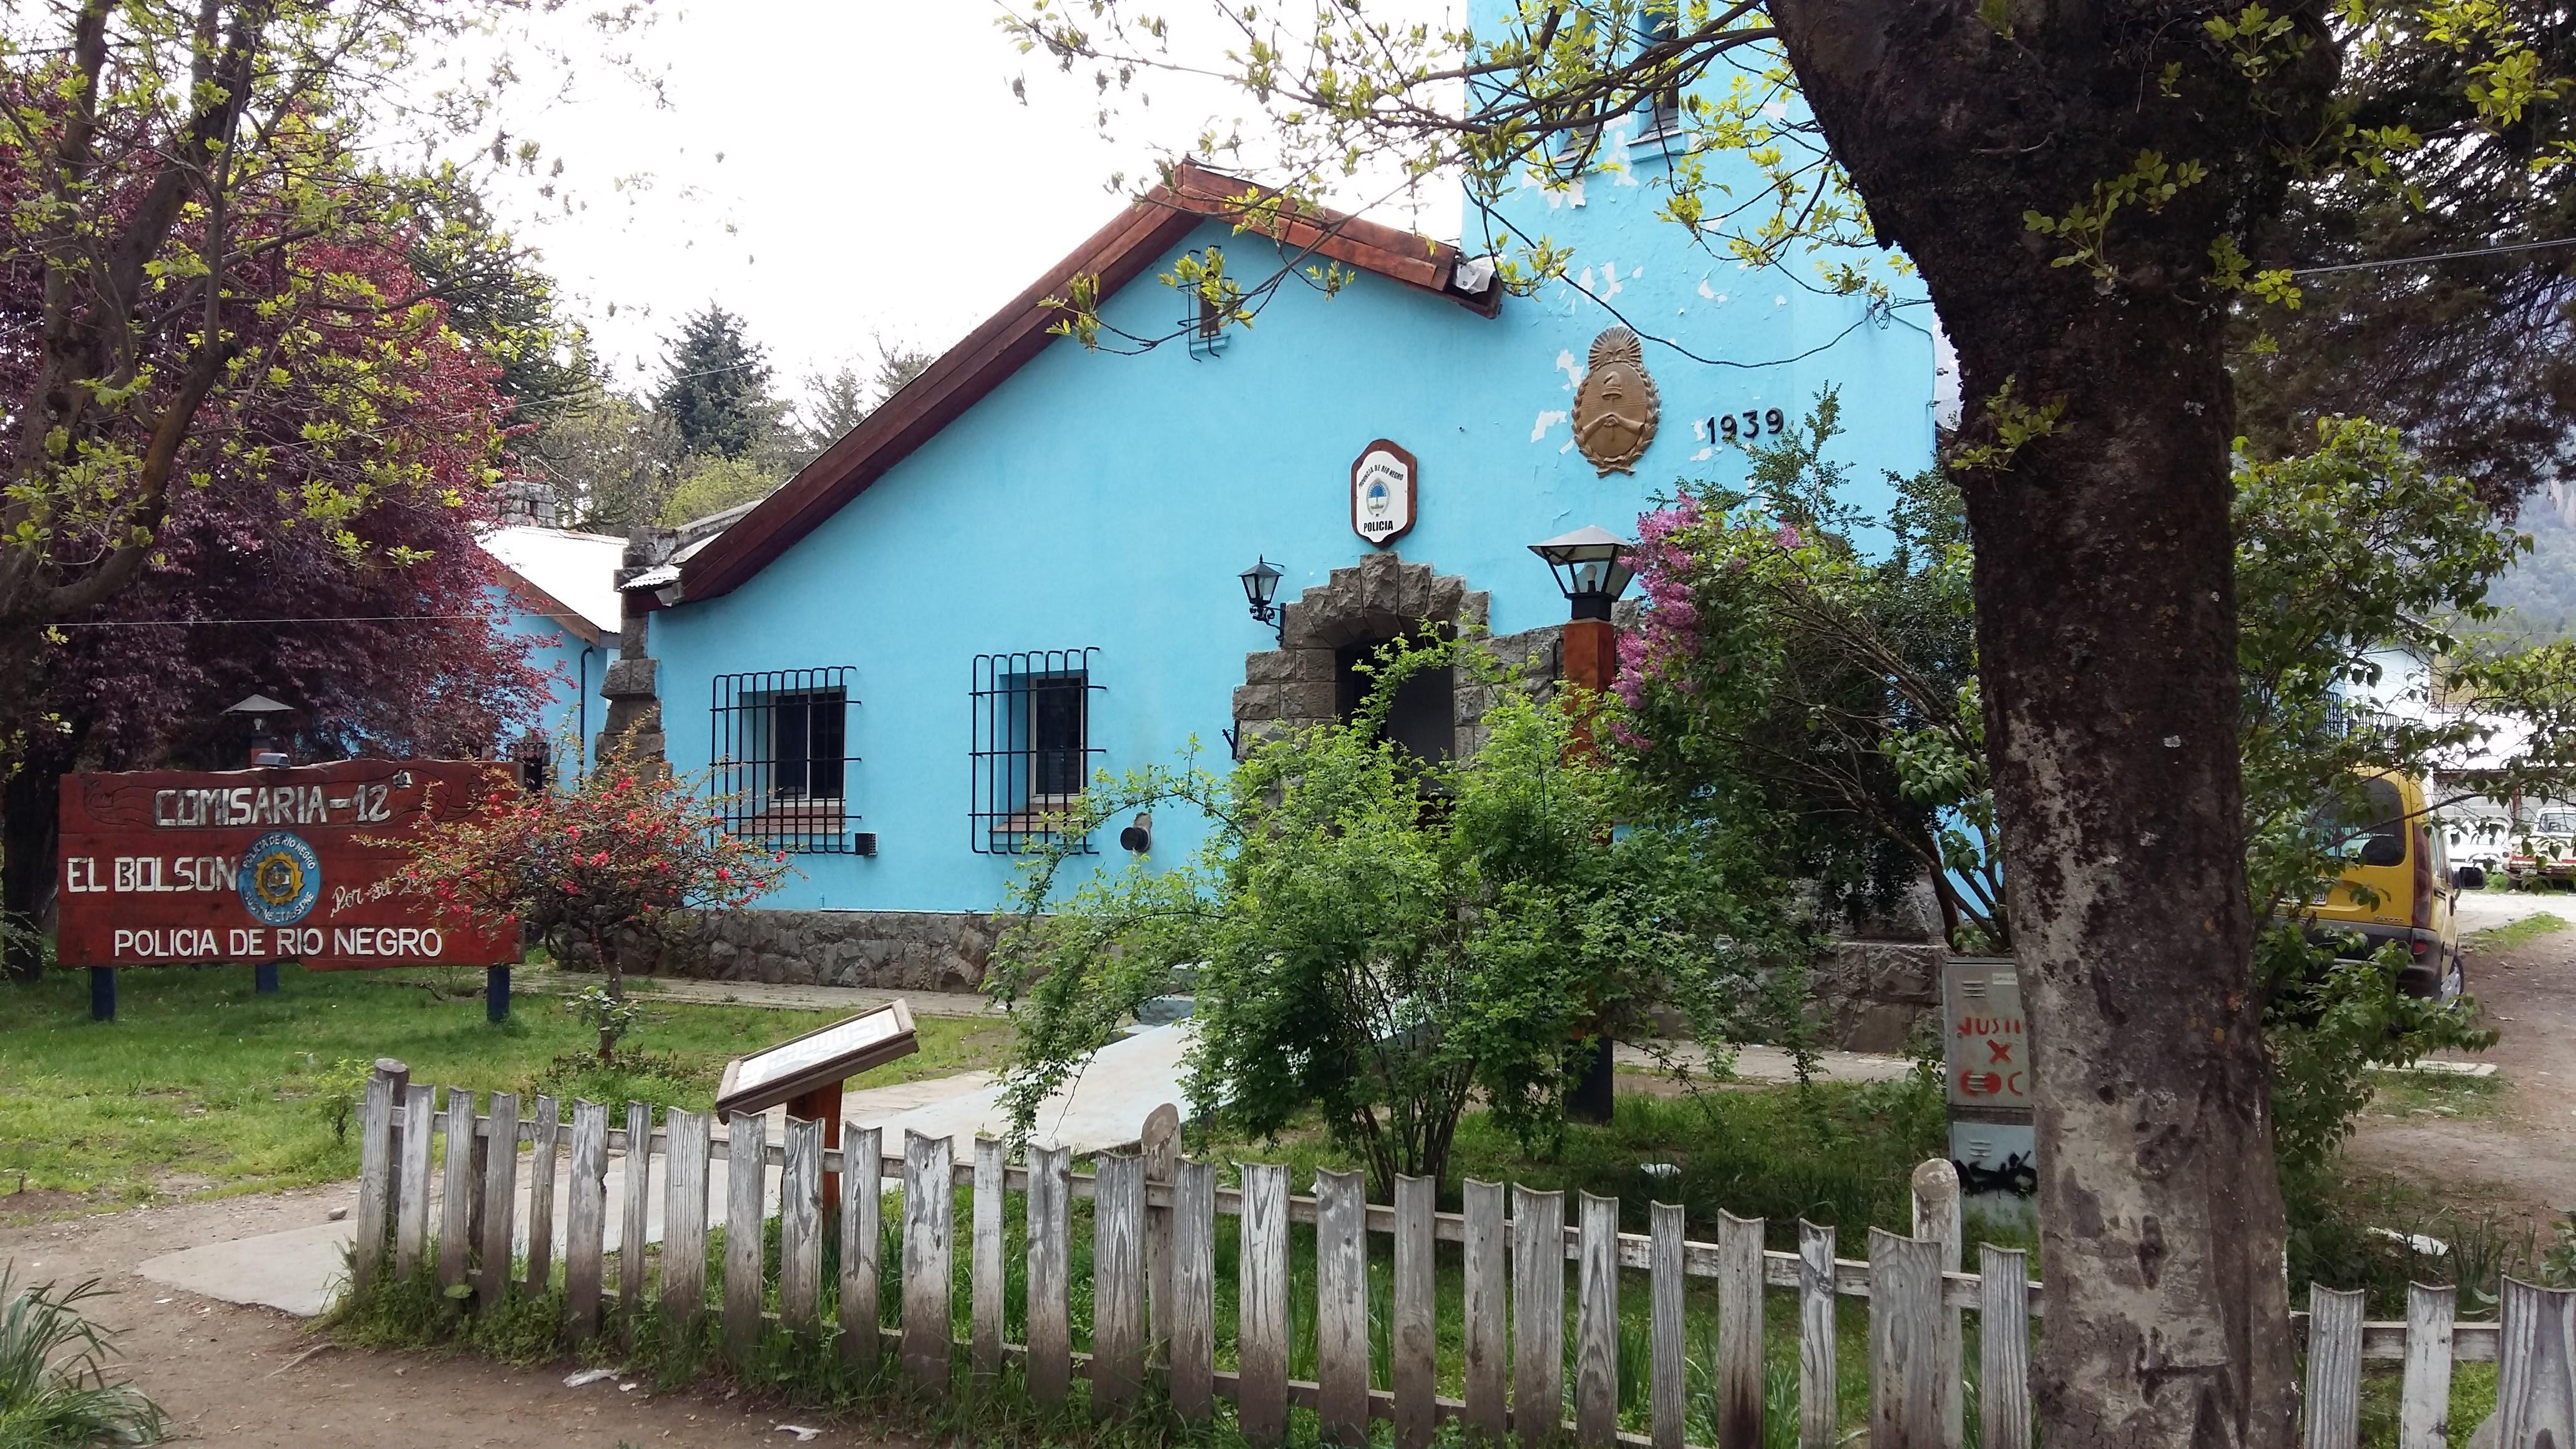 EL BOLSÓN: DETIENEN A UN ALBAÑIL QUE HIRIÓ A UNA MUJER